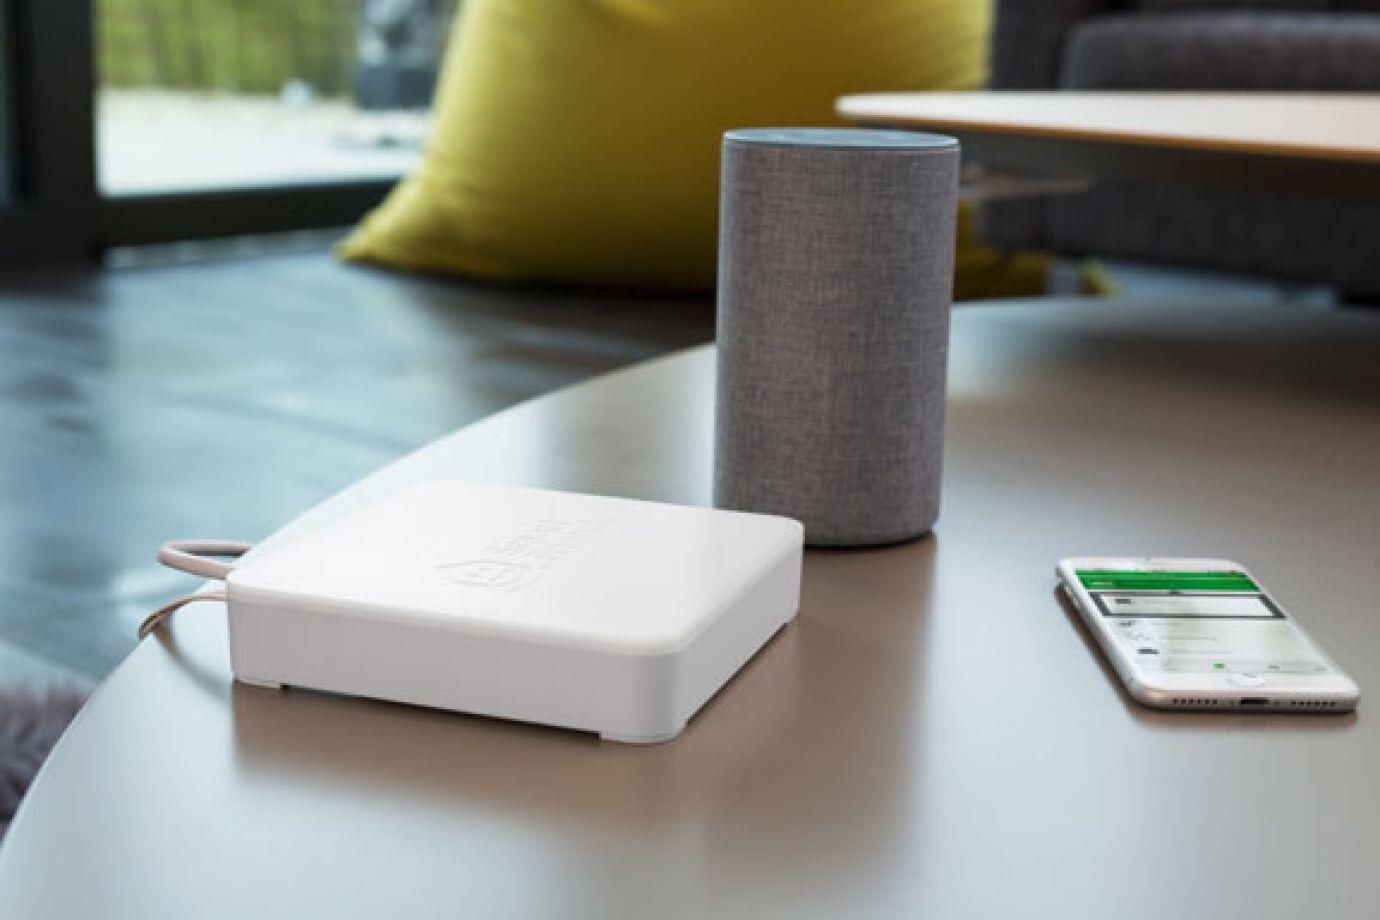 smart-home-smart-friends-alexa-und-handy.jpg